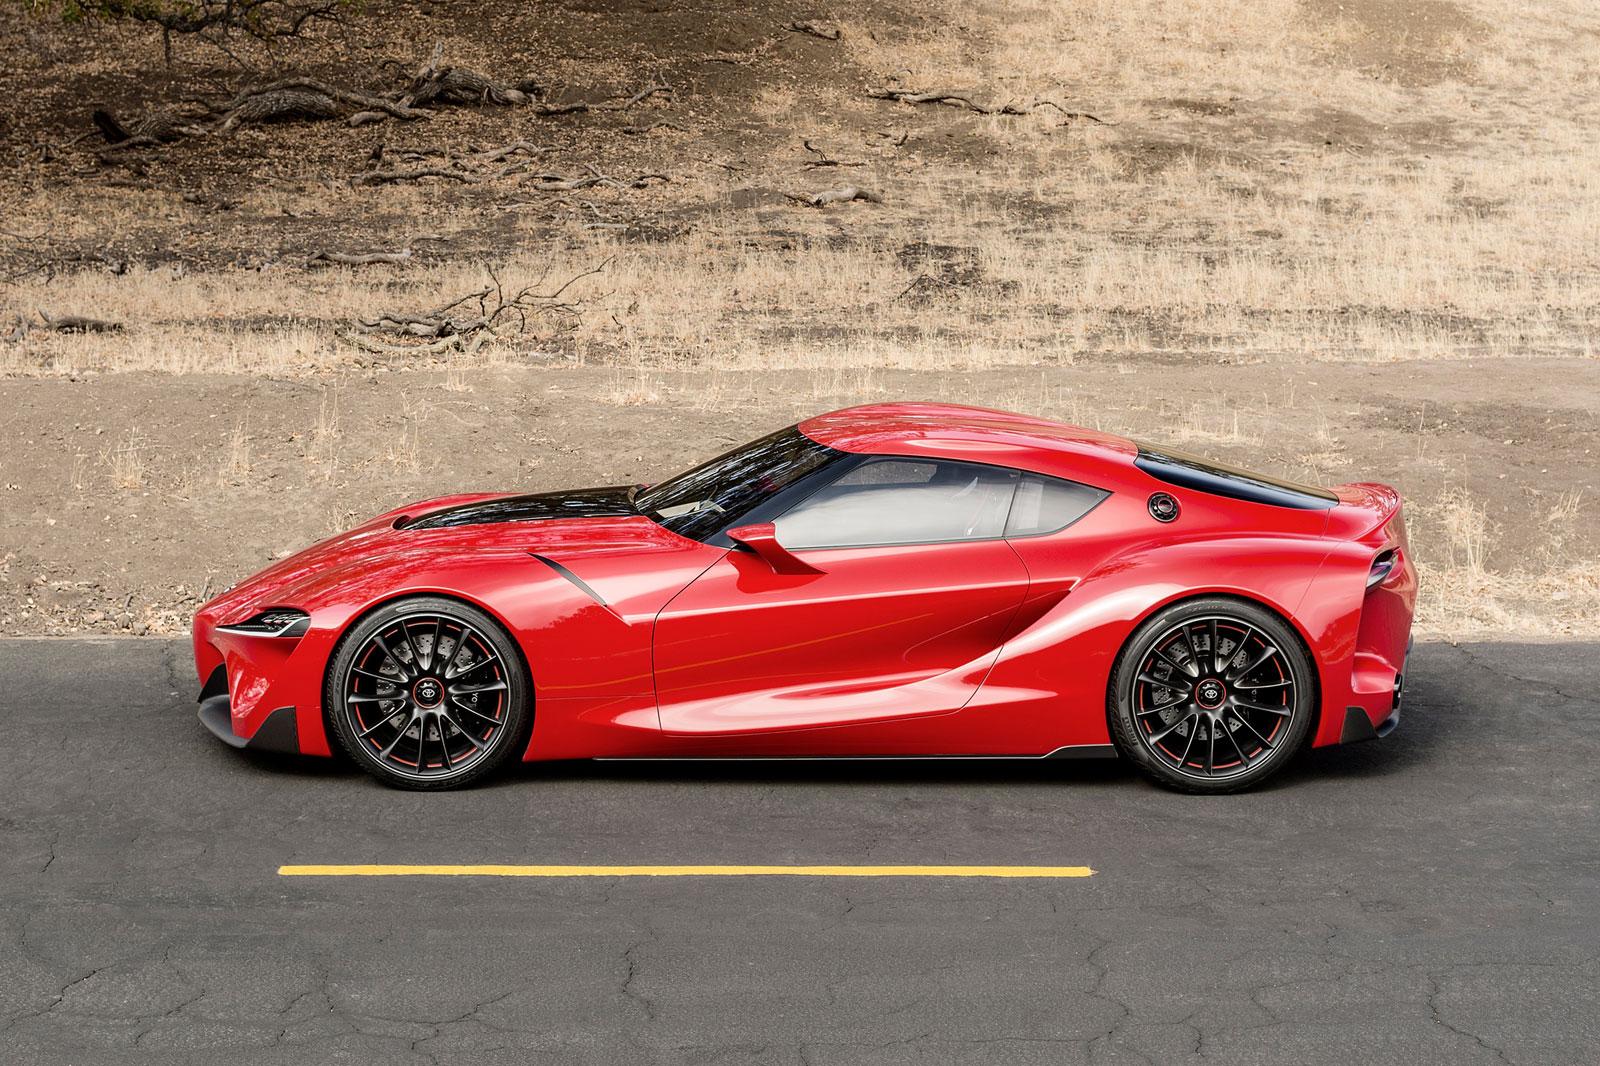 Toyota FT-1 Concept - Car Body Design